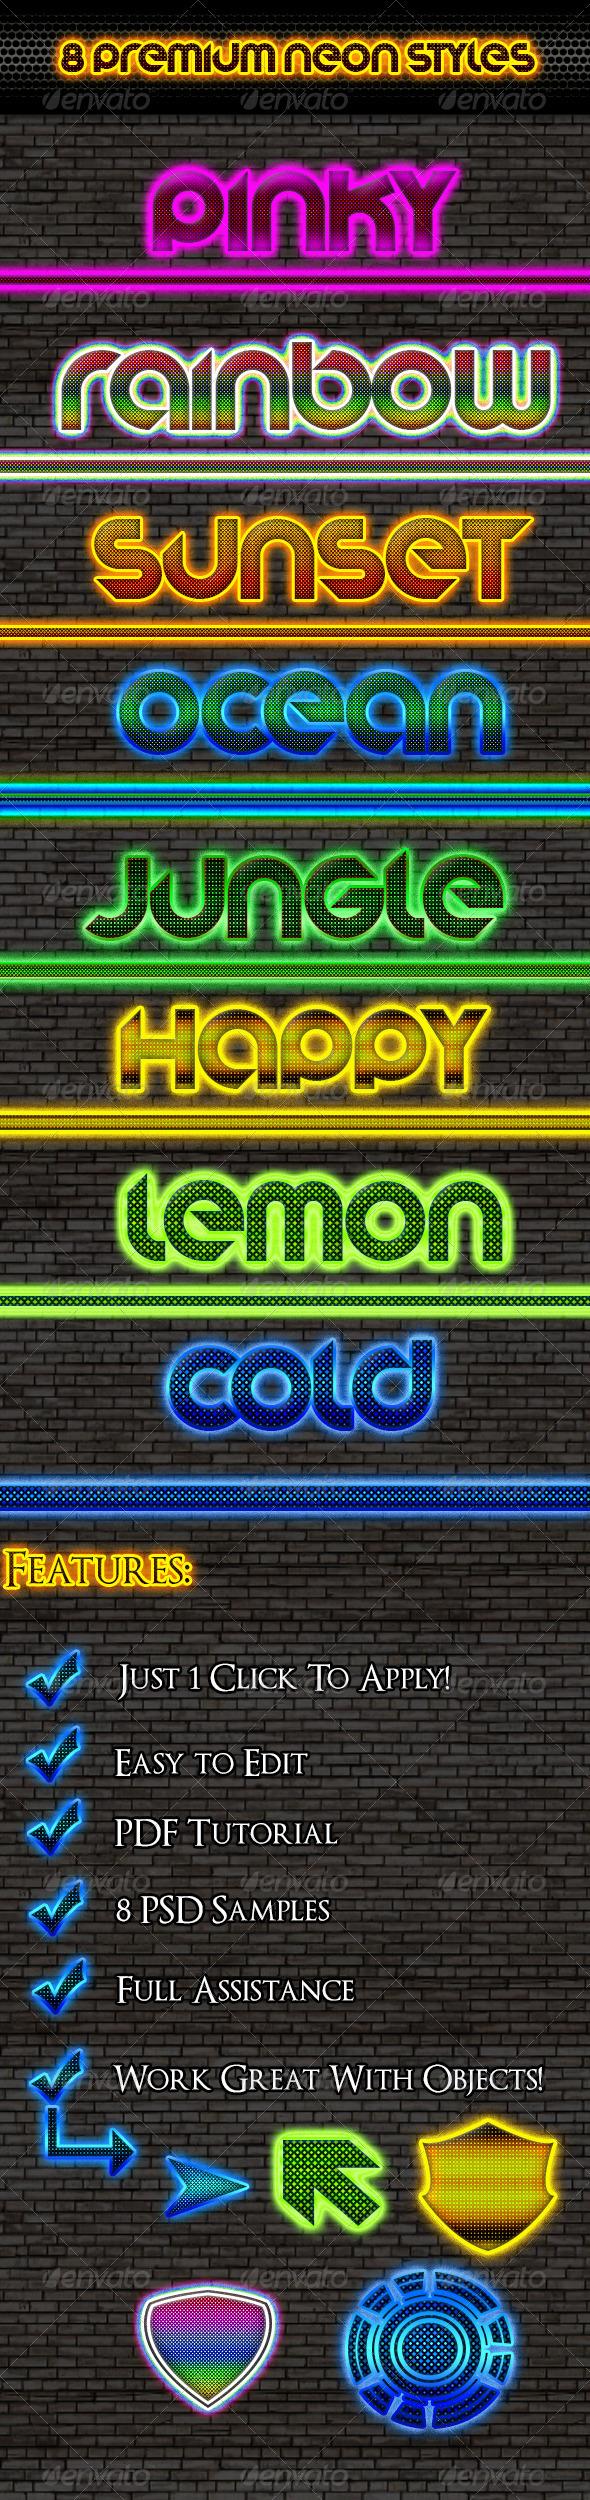 GraphicRiver 8 Premium Neon Styles 6898619